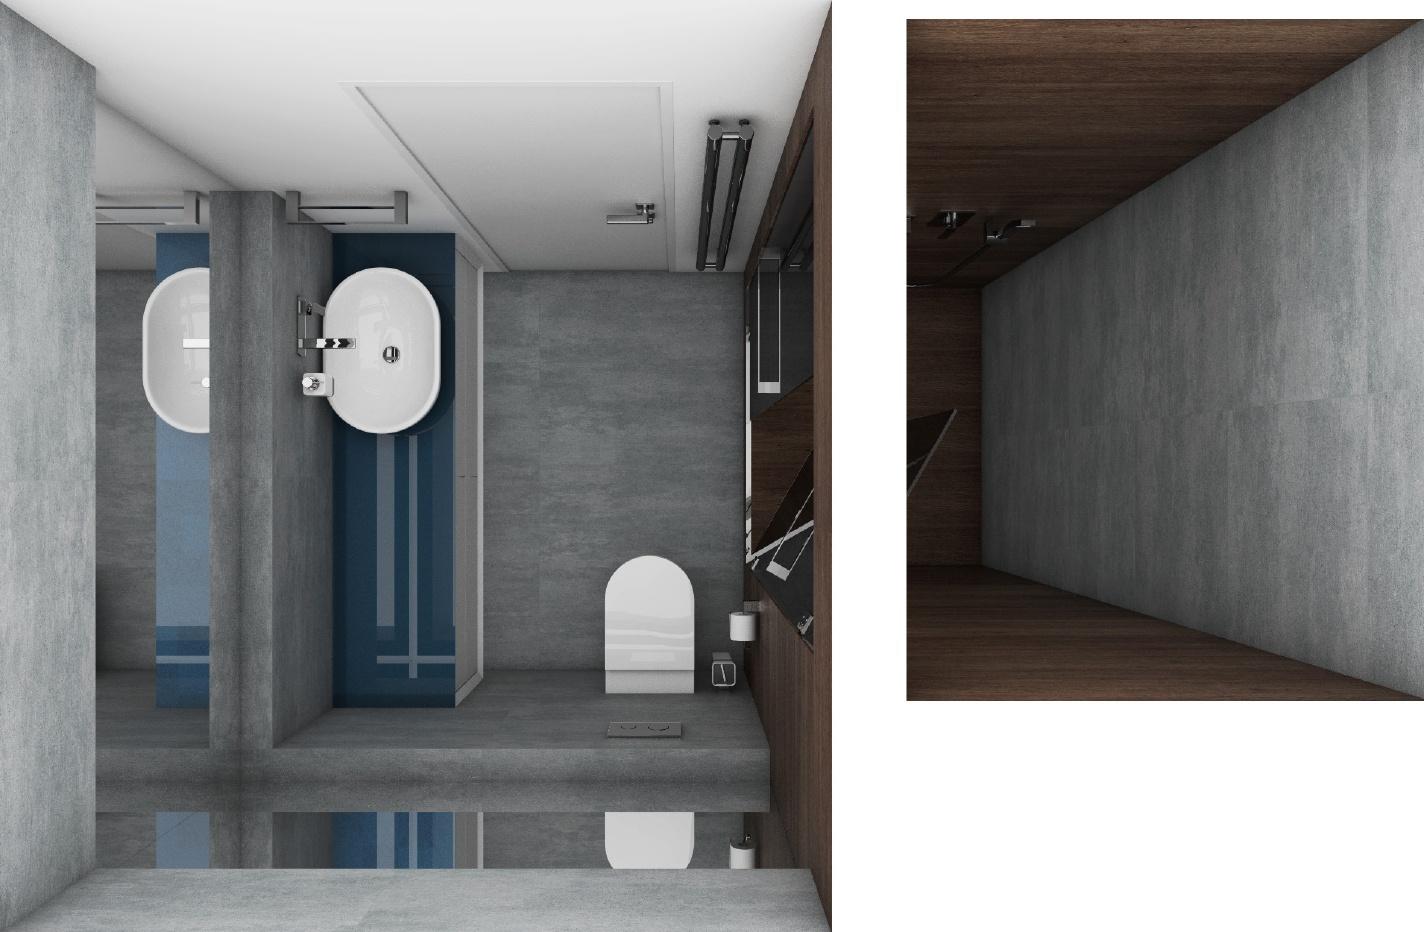 Modernes badezimmer cross blue perfecto design - Moderne badezimmer grundrisse ...